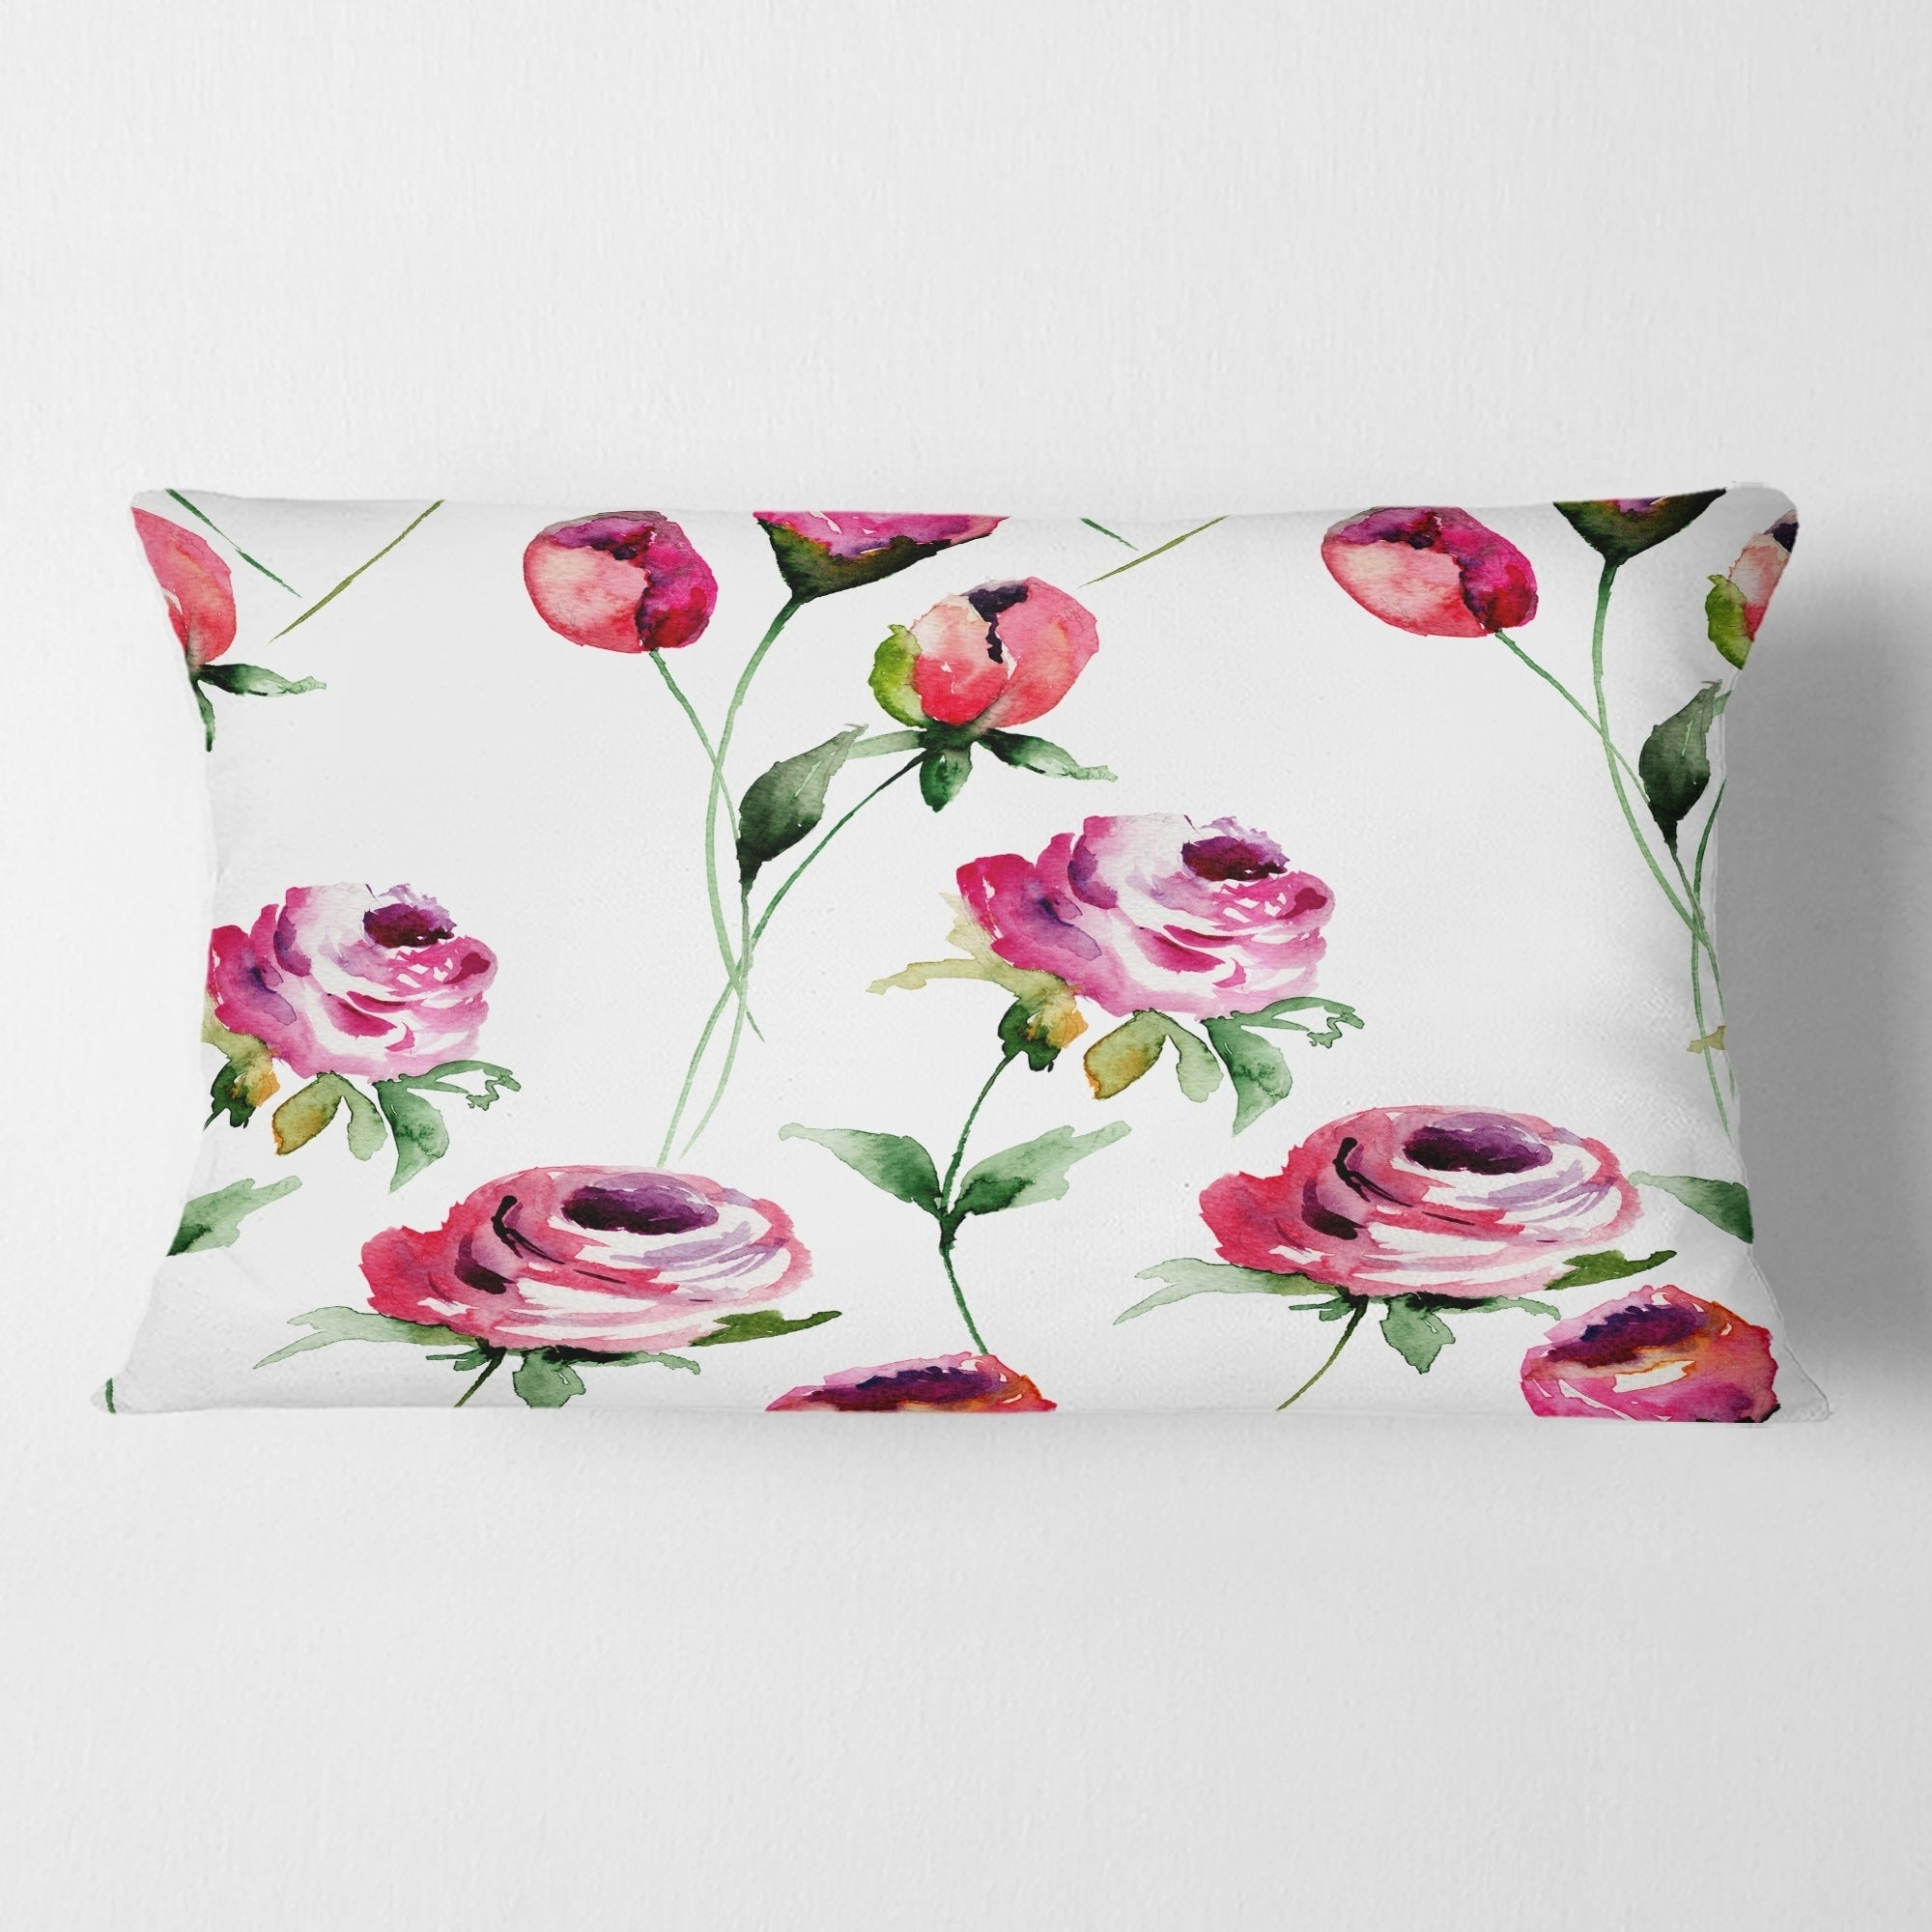 Designart Roses Flowers Pattern Mid Century Modern Throw Pillow Overstock 29063800